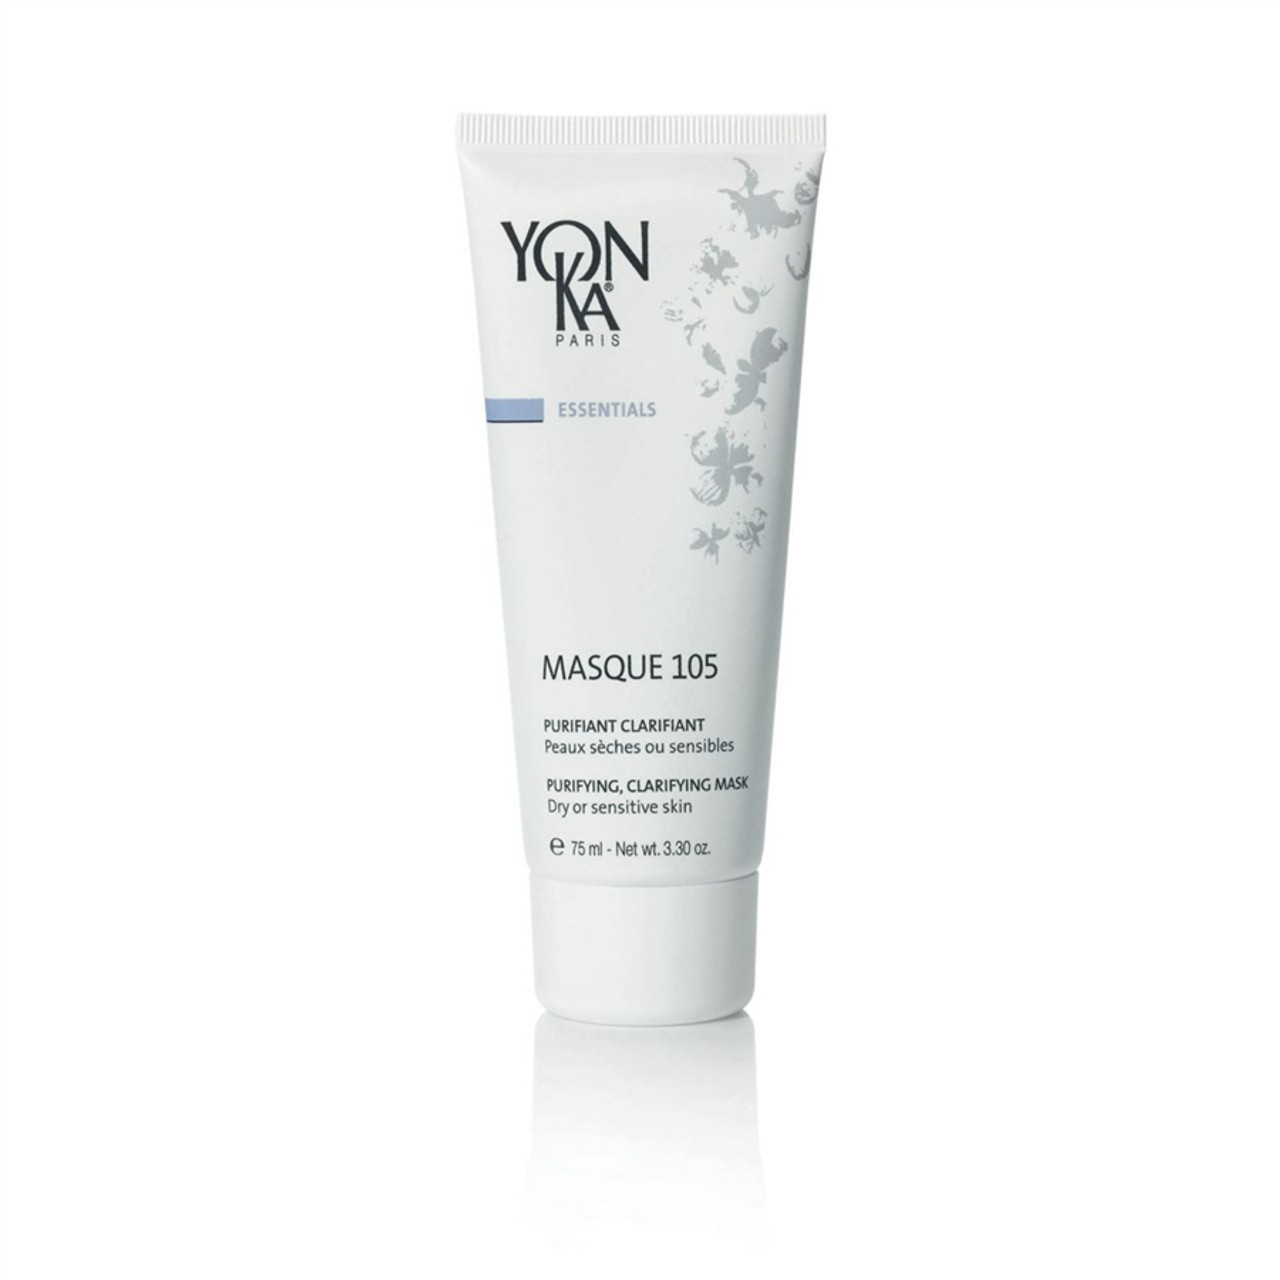 Yon-ka Masque 105 Purify Clarify for Dry and Sensitive  3.30 oz